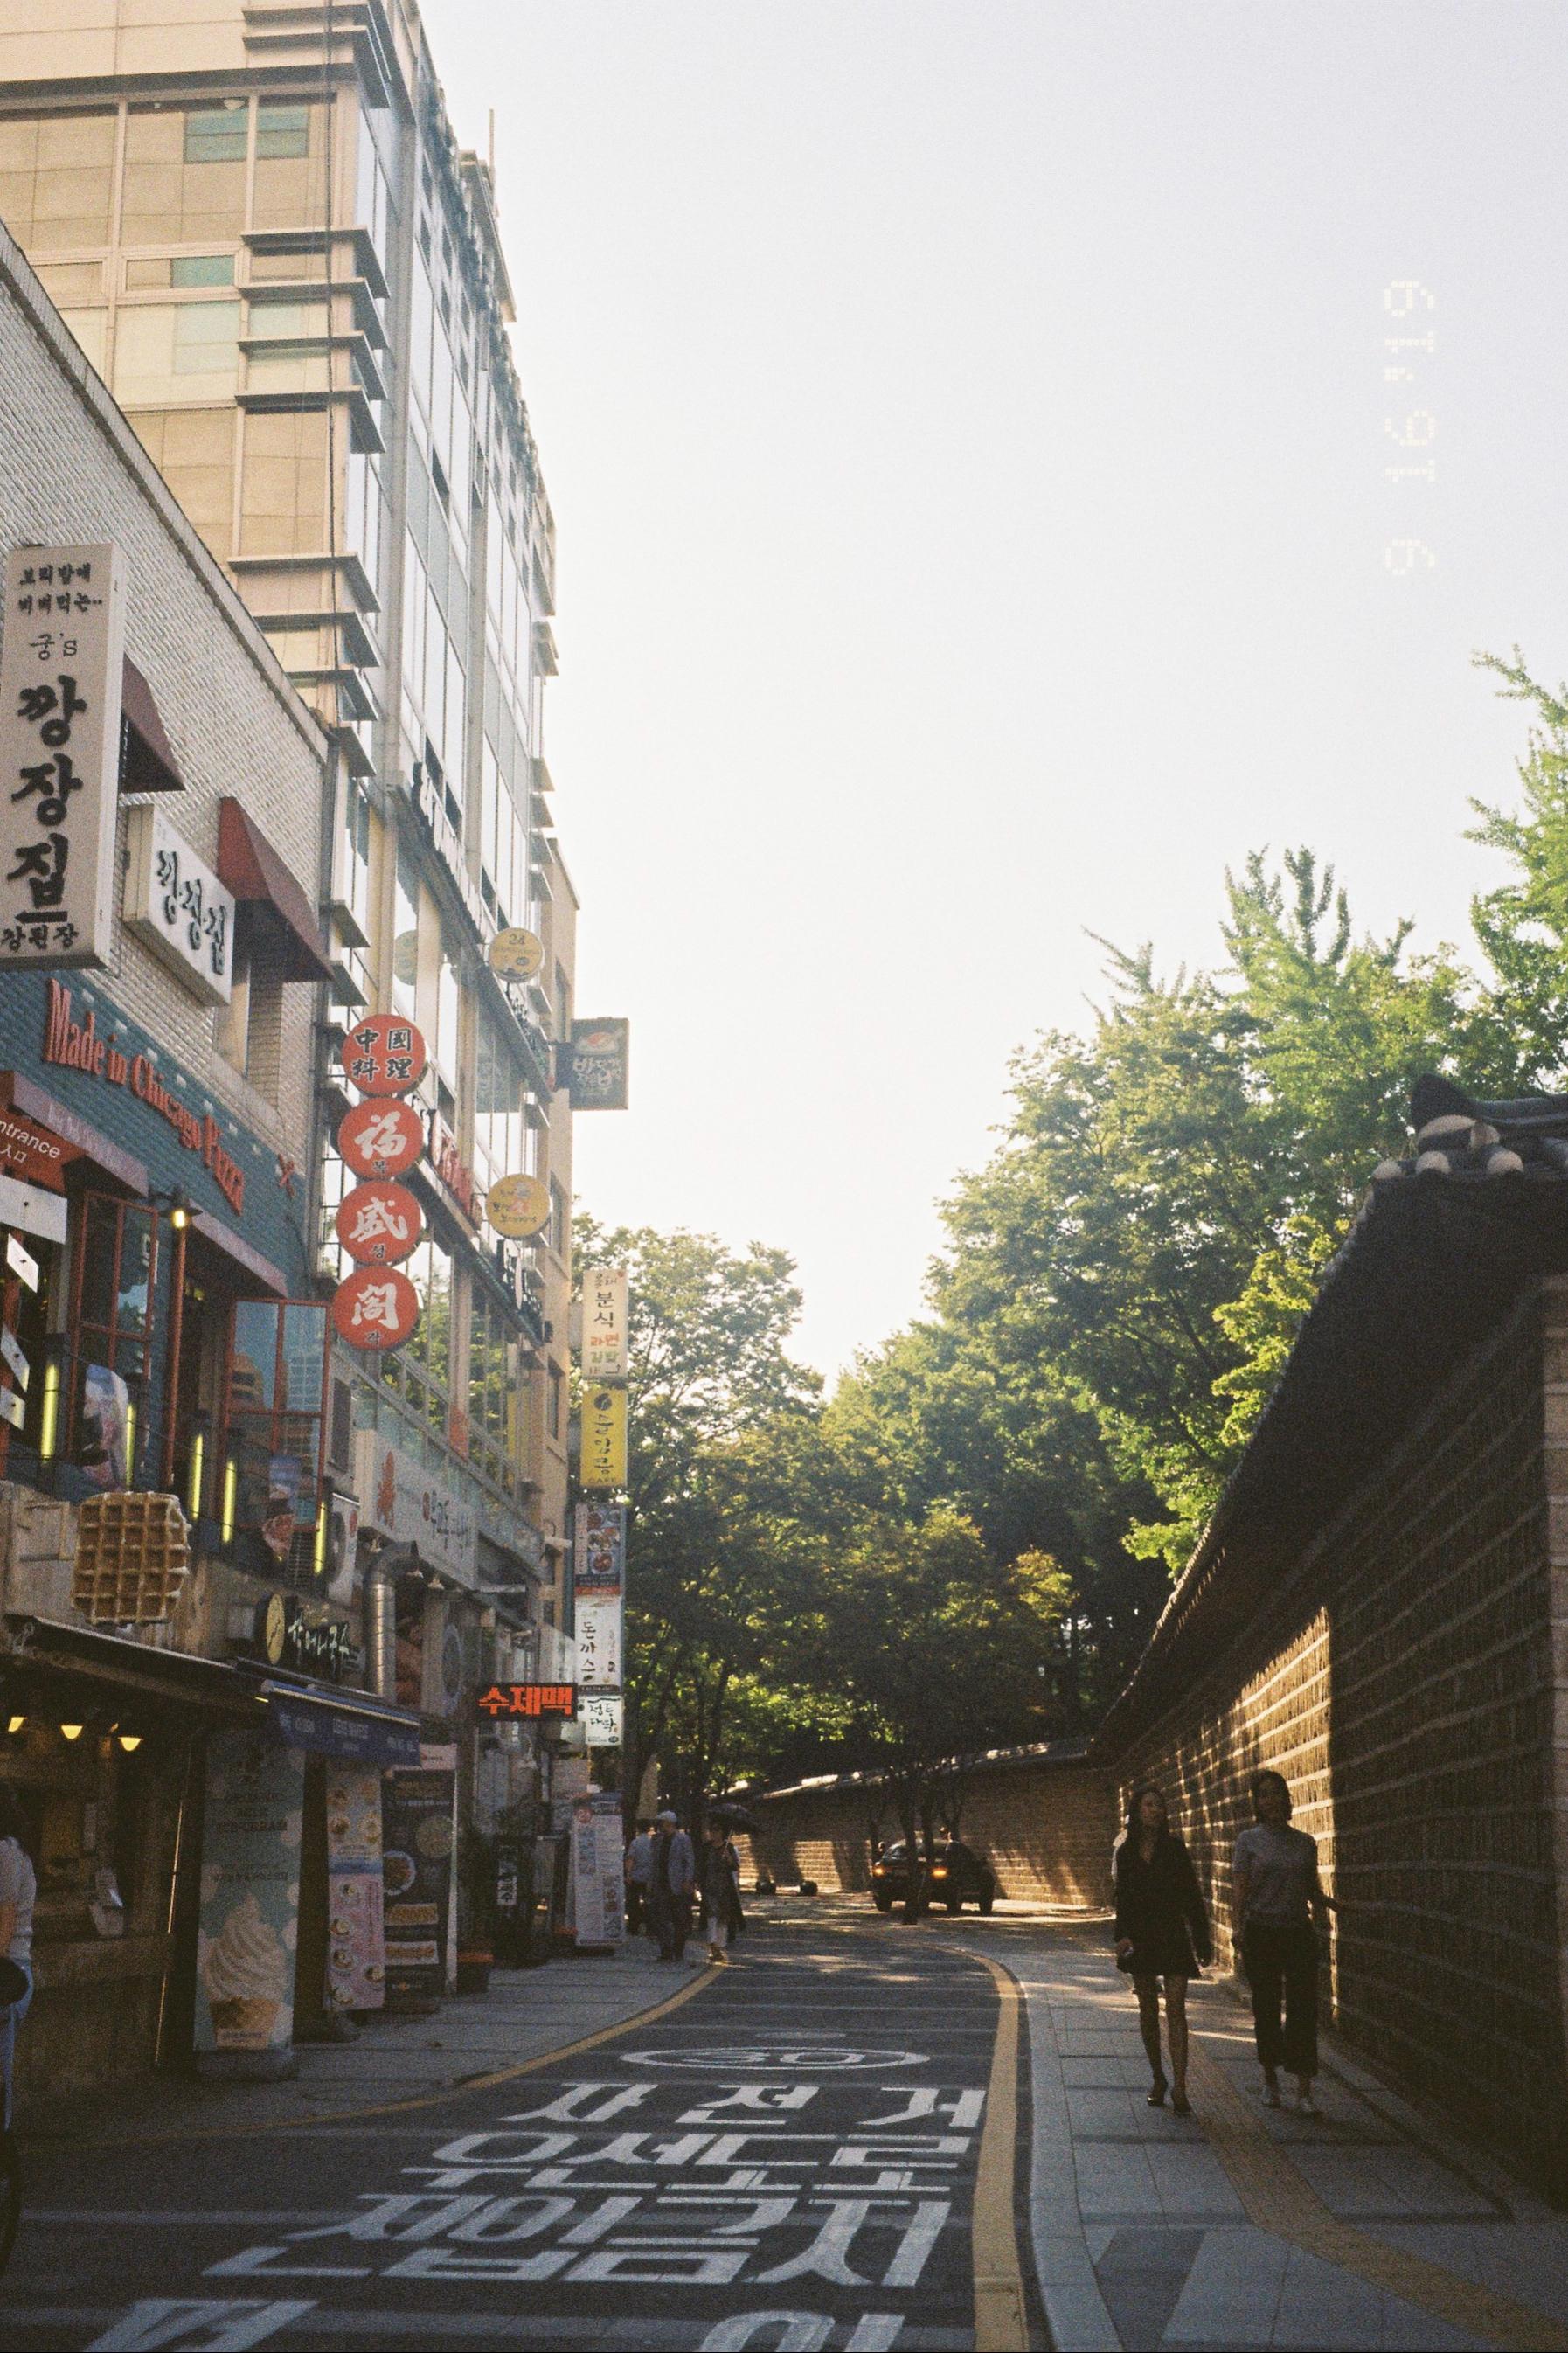 Seoul taken by my guest Summer